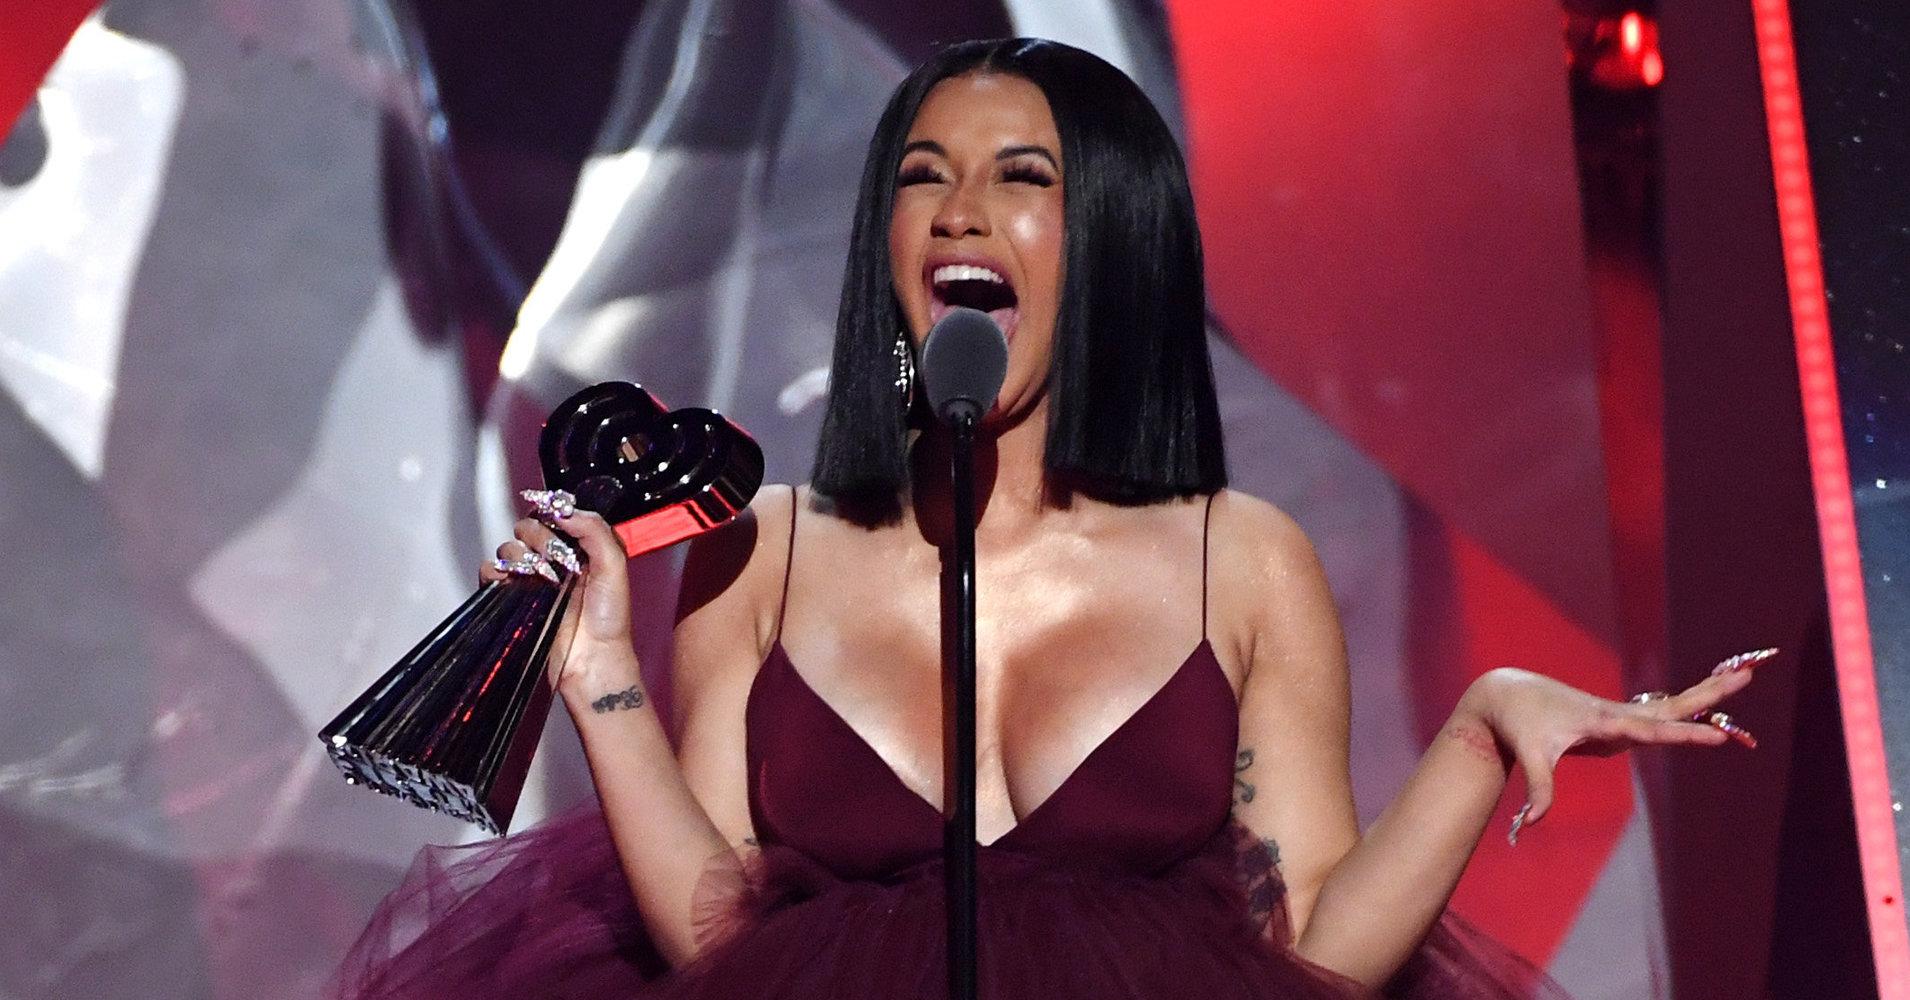 Cardi B to Make First Post-Pregnancy Performance at 2018 Mala Luna Festival